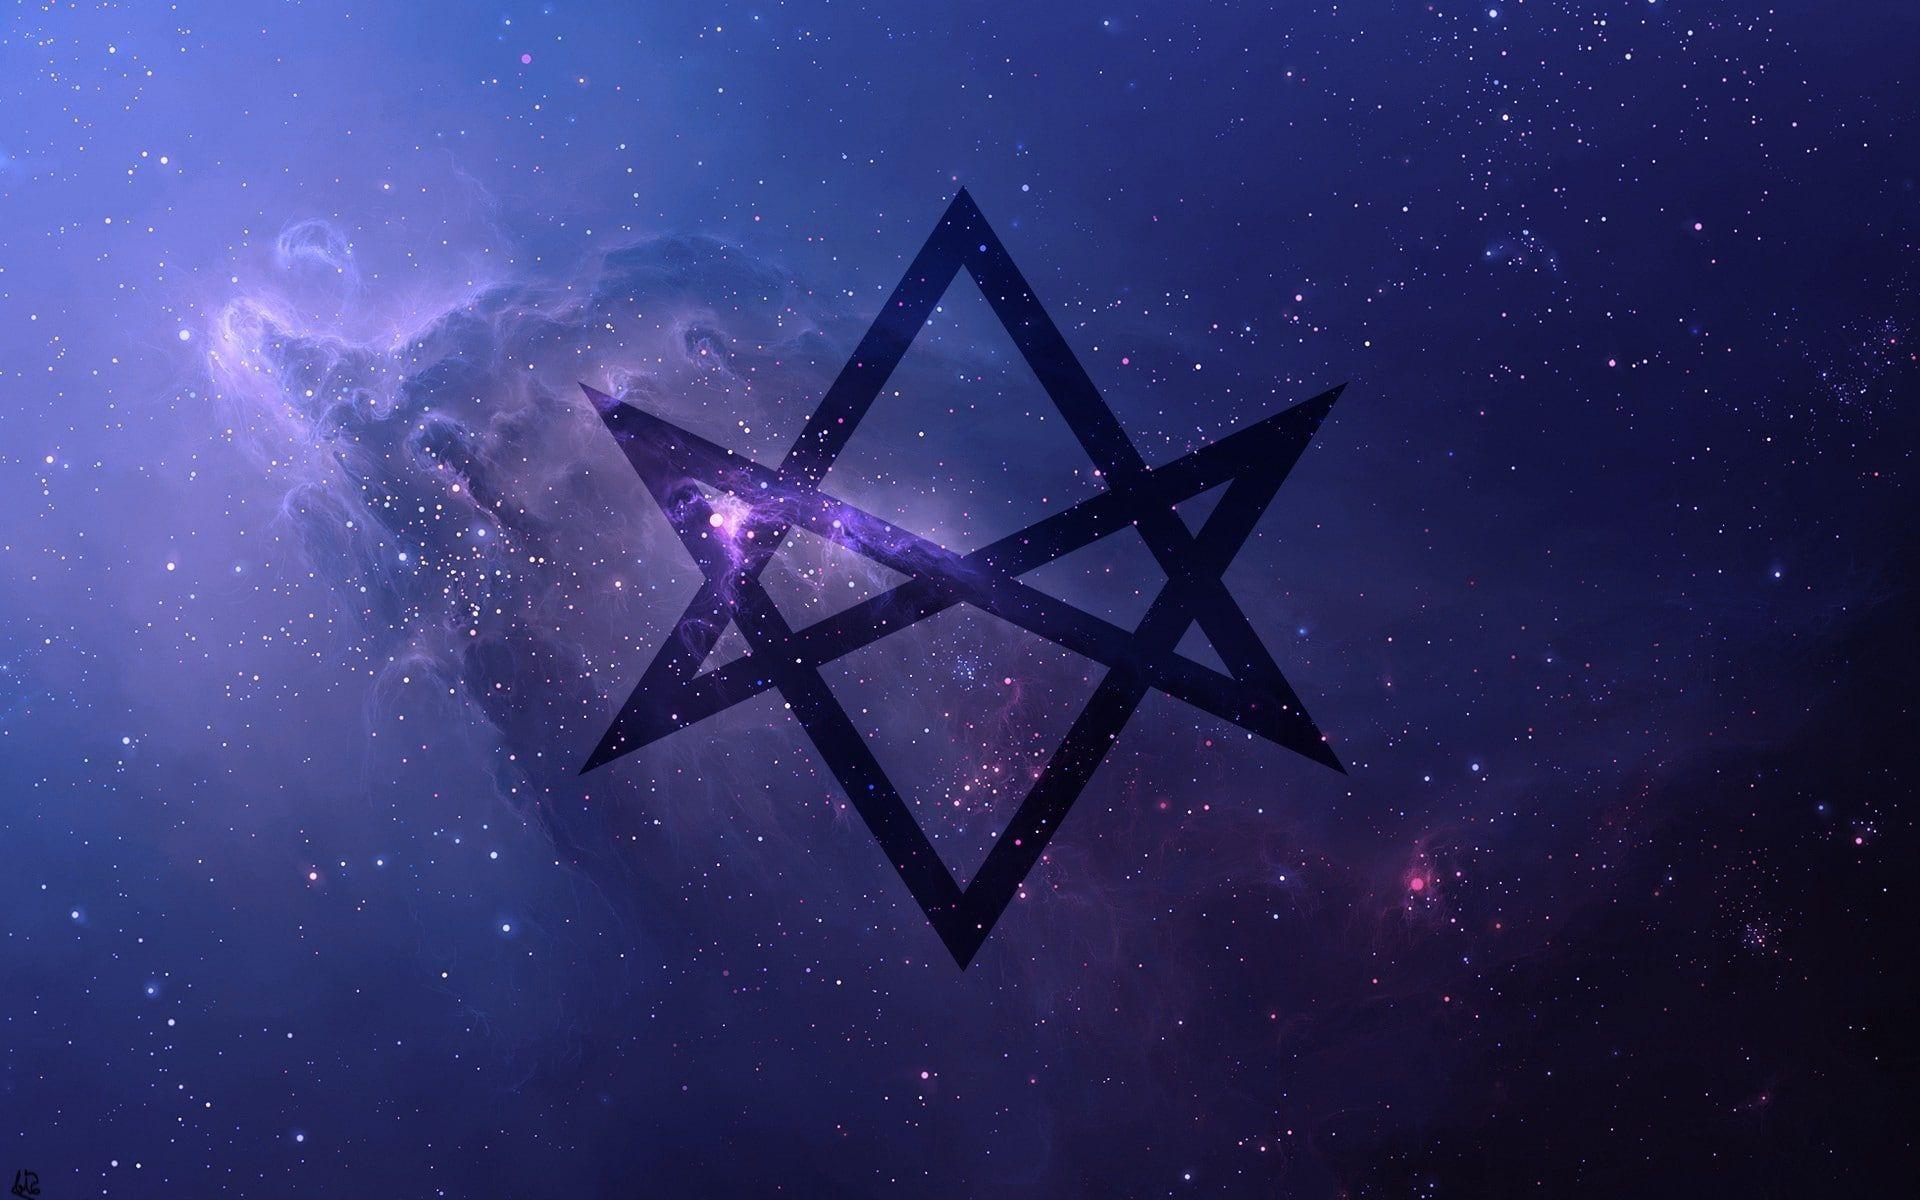 Thelema Unicursal Hexagram Space Universe Purple Bring Me The Horizon 1080p Wallpaper Hdwallpaper Desktop Bring Me The Horizon Star Wars Awesome Wallpaper